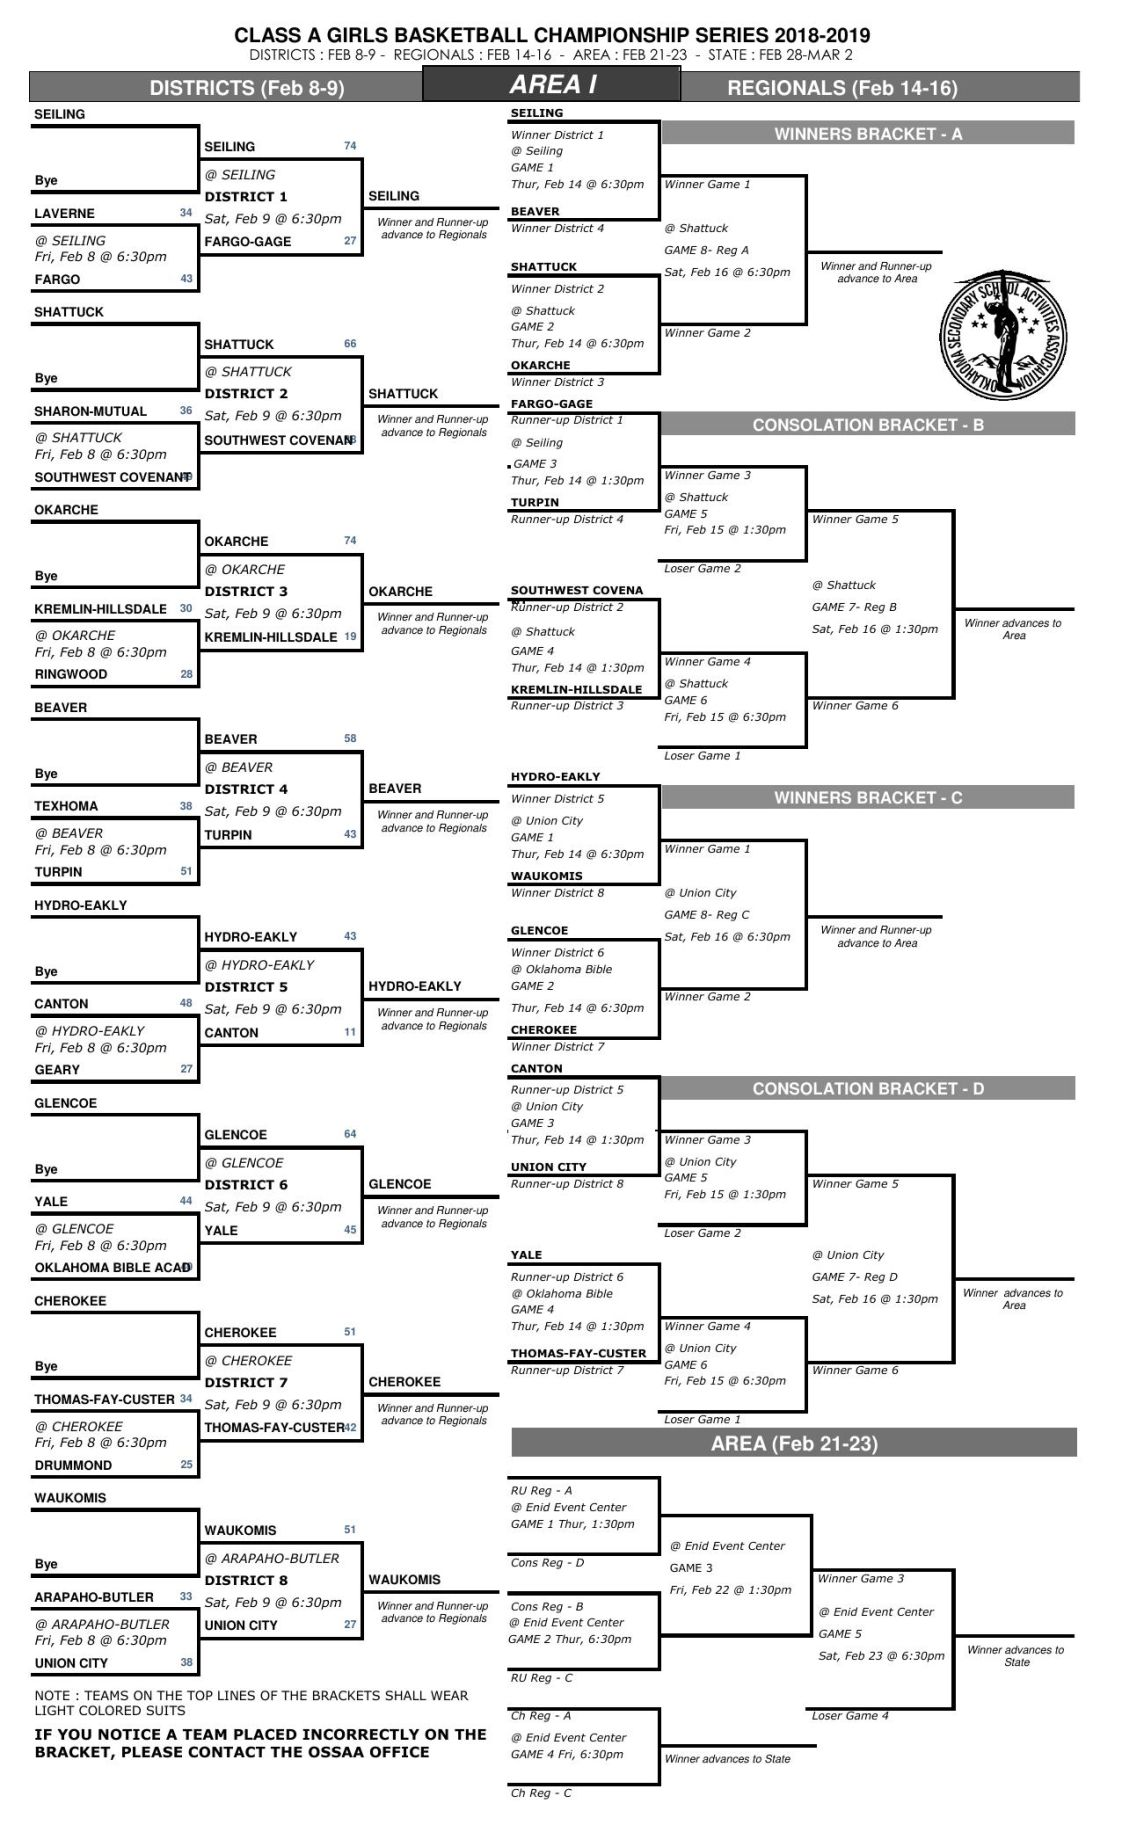 BK_2018-19_AGArea1 (1).pdf